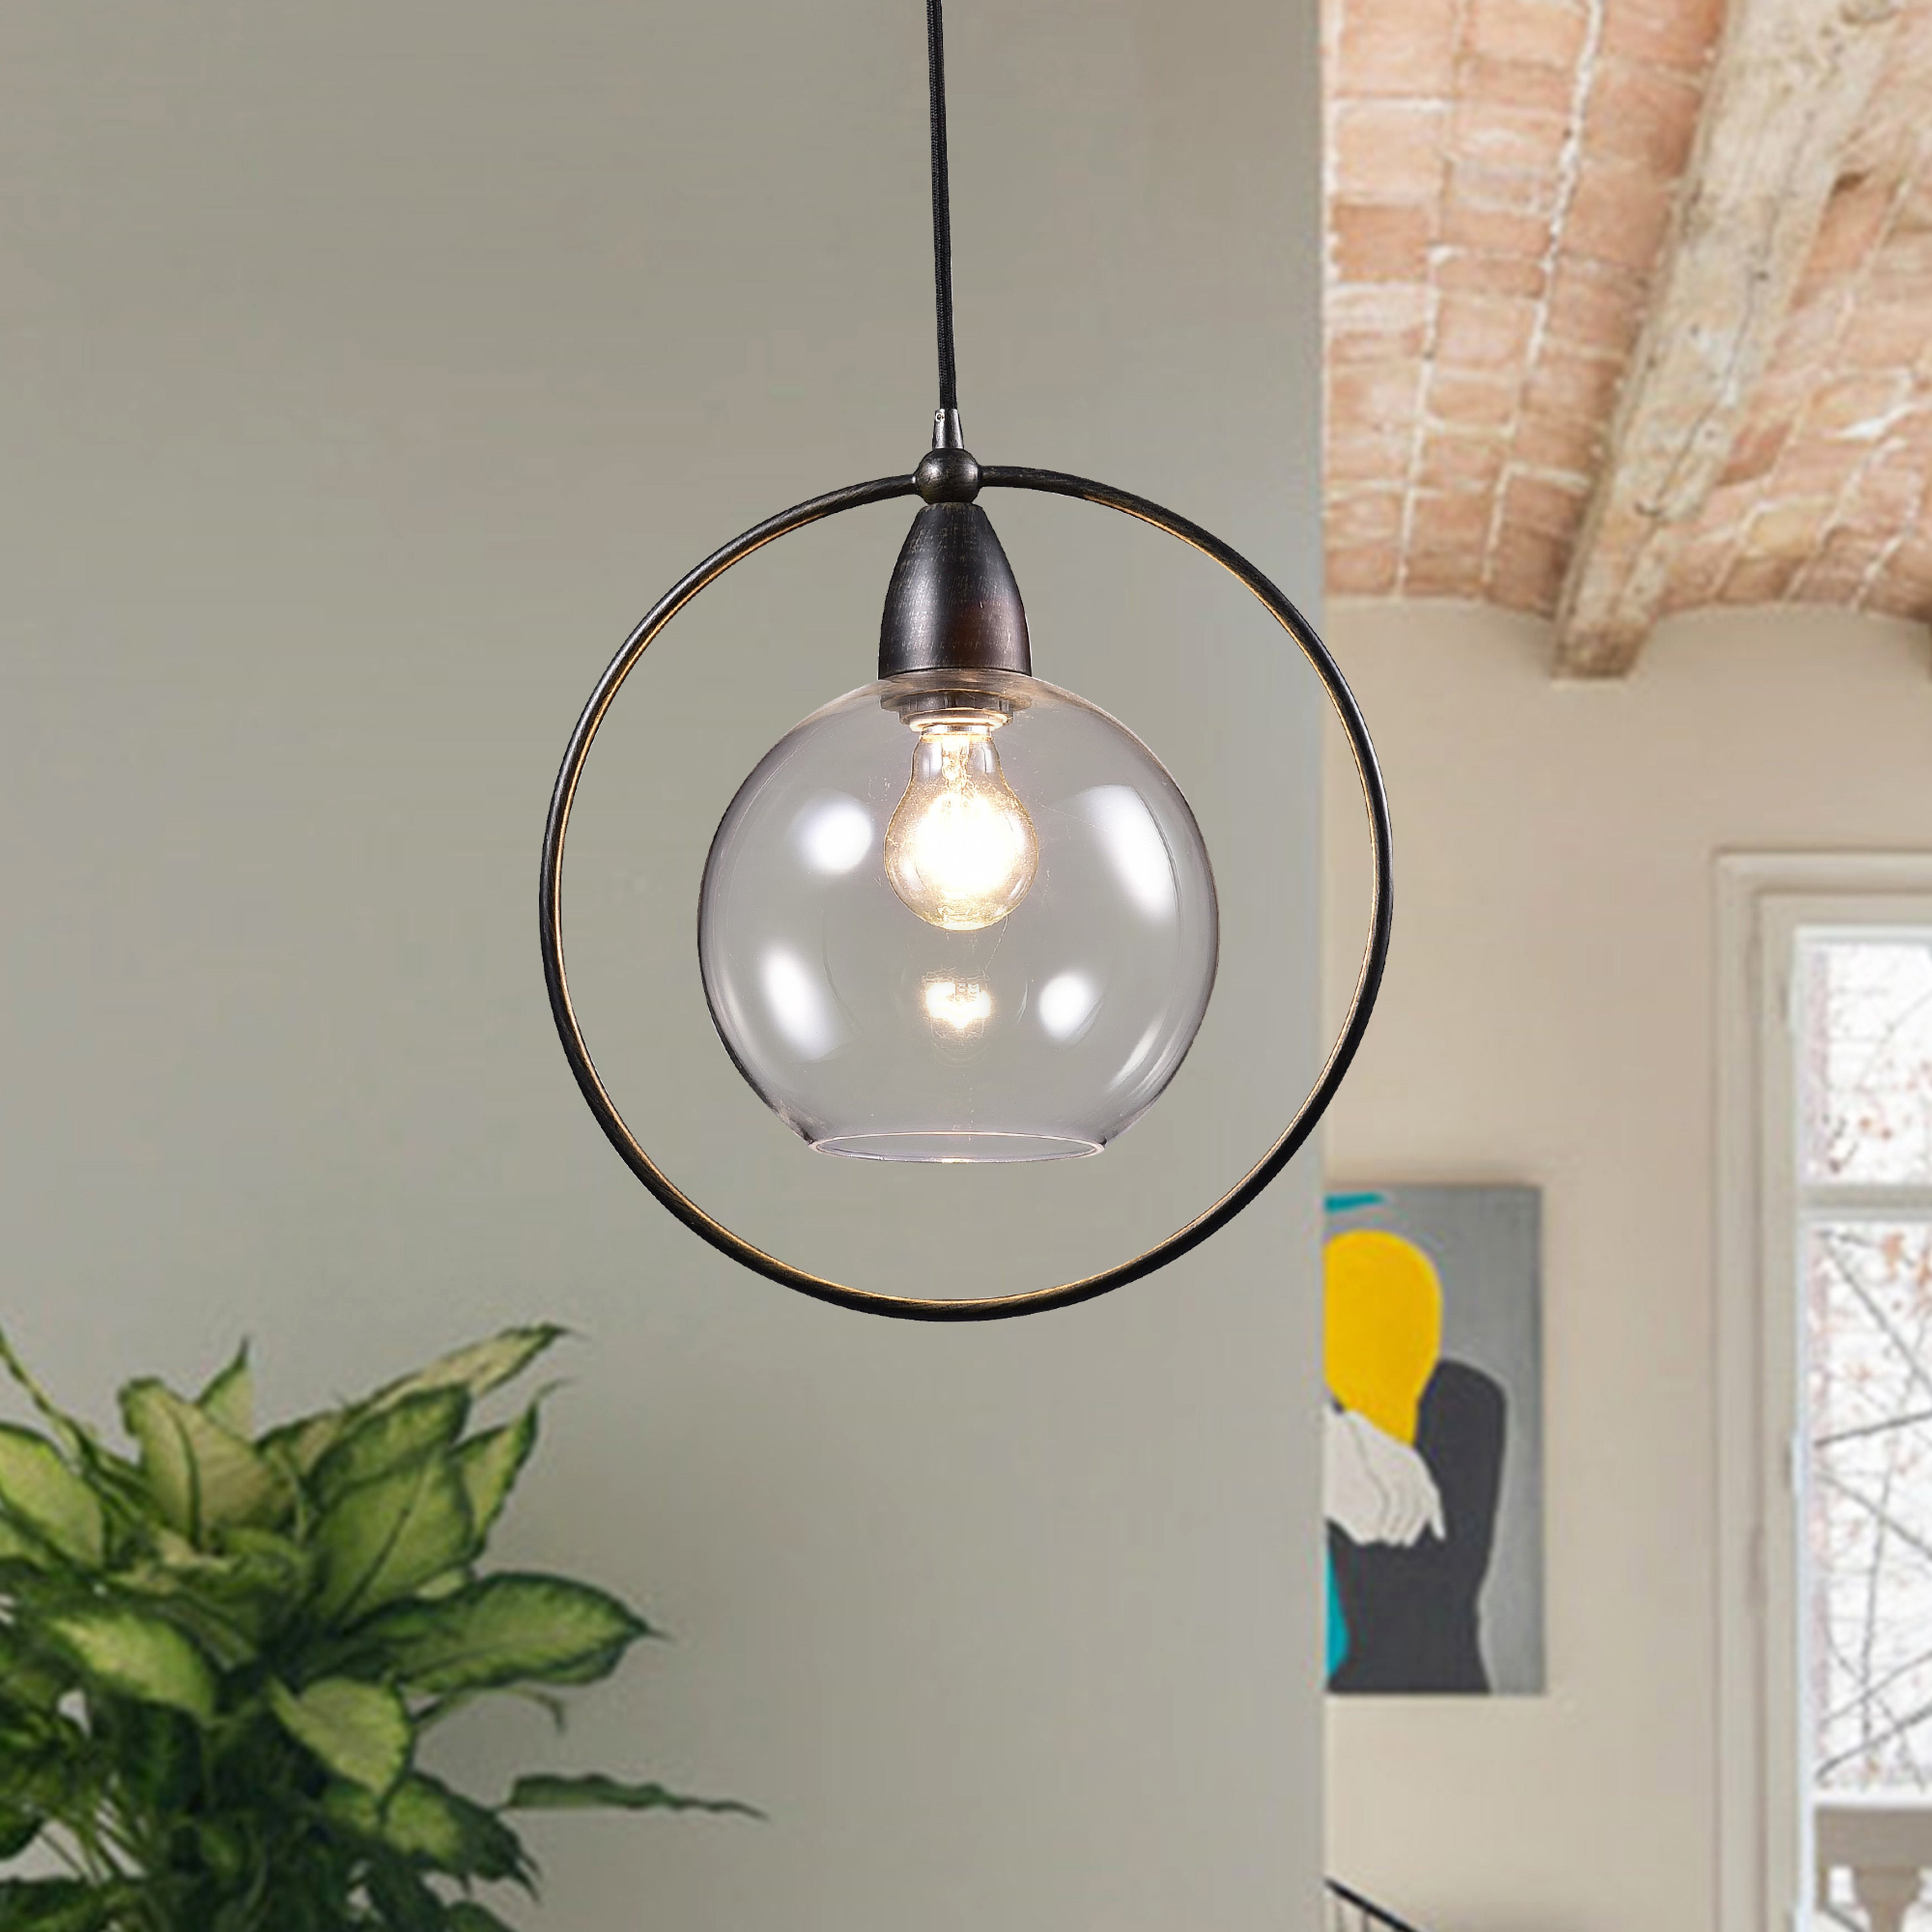 Buy Globe Pendant Lighting Online at Overstock.com | Our Best ...